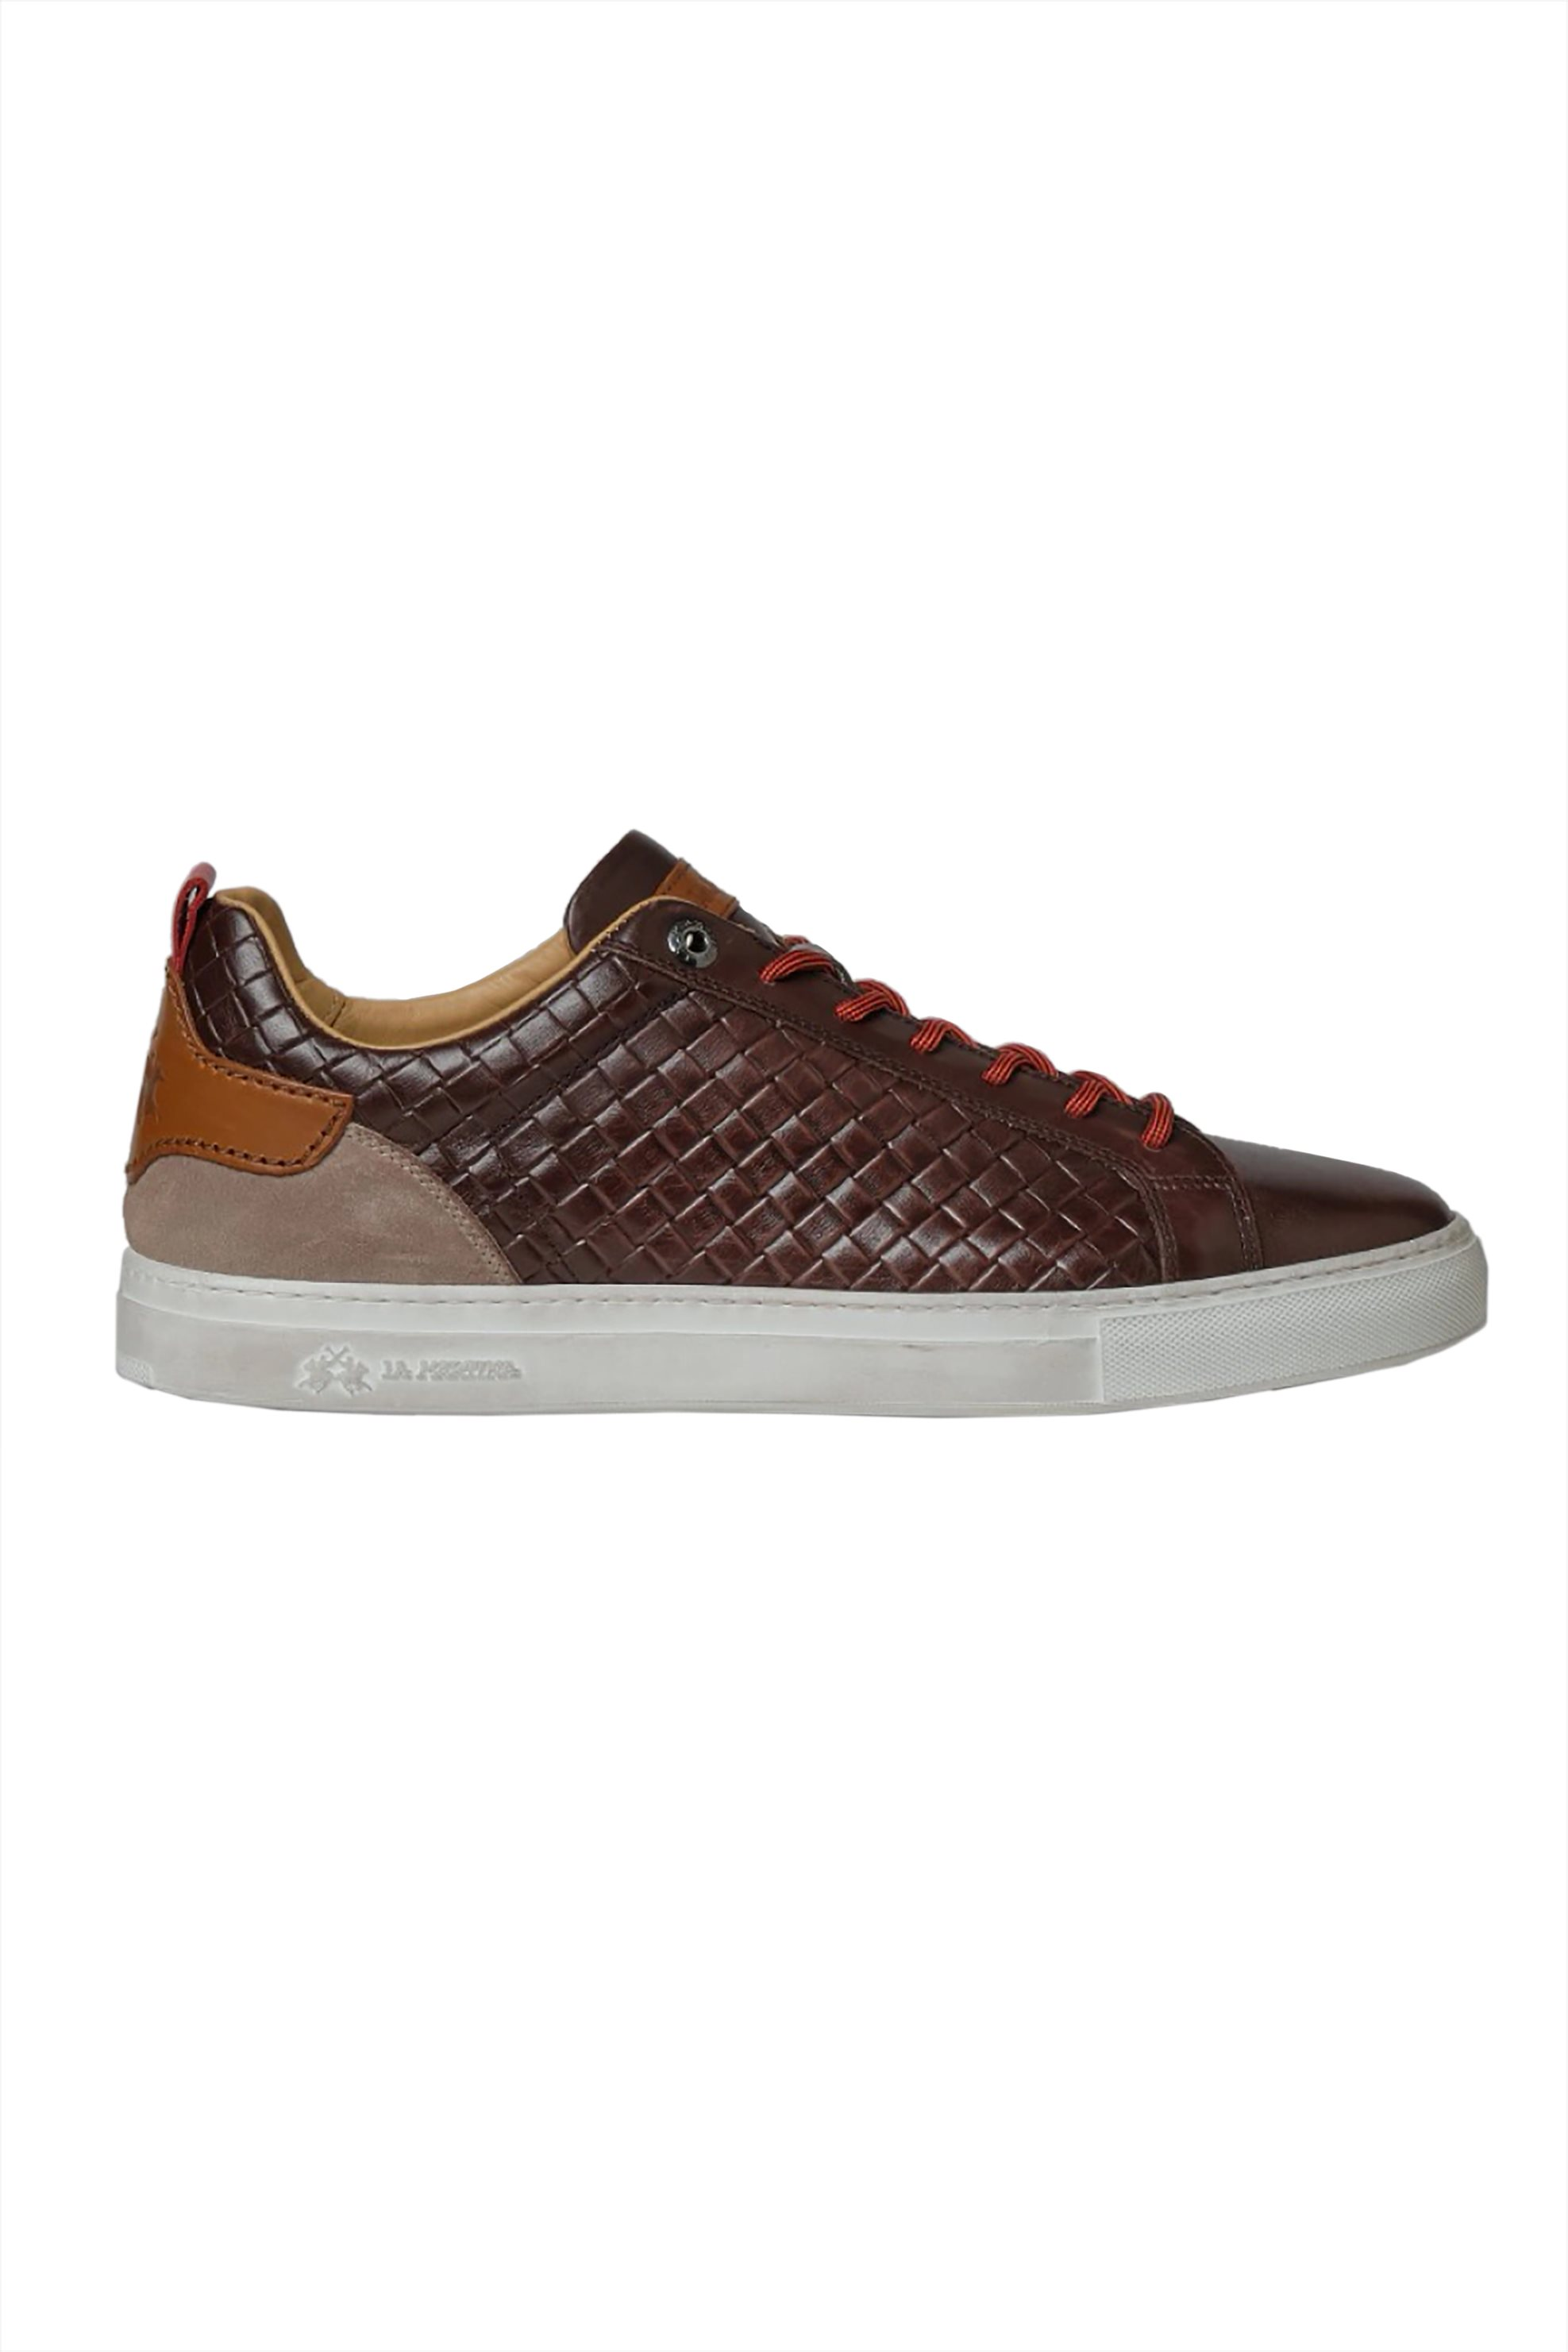 La Martina ανδρικά sneakers με ανάγλυφο σχέδιο και contrast λεπτομέρειες – LFM211012-2080 – Καφέ